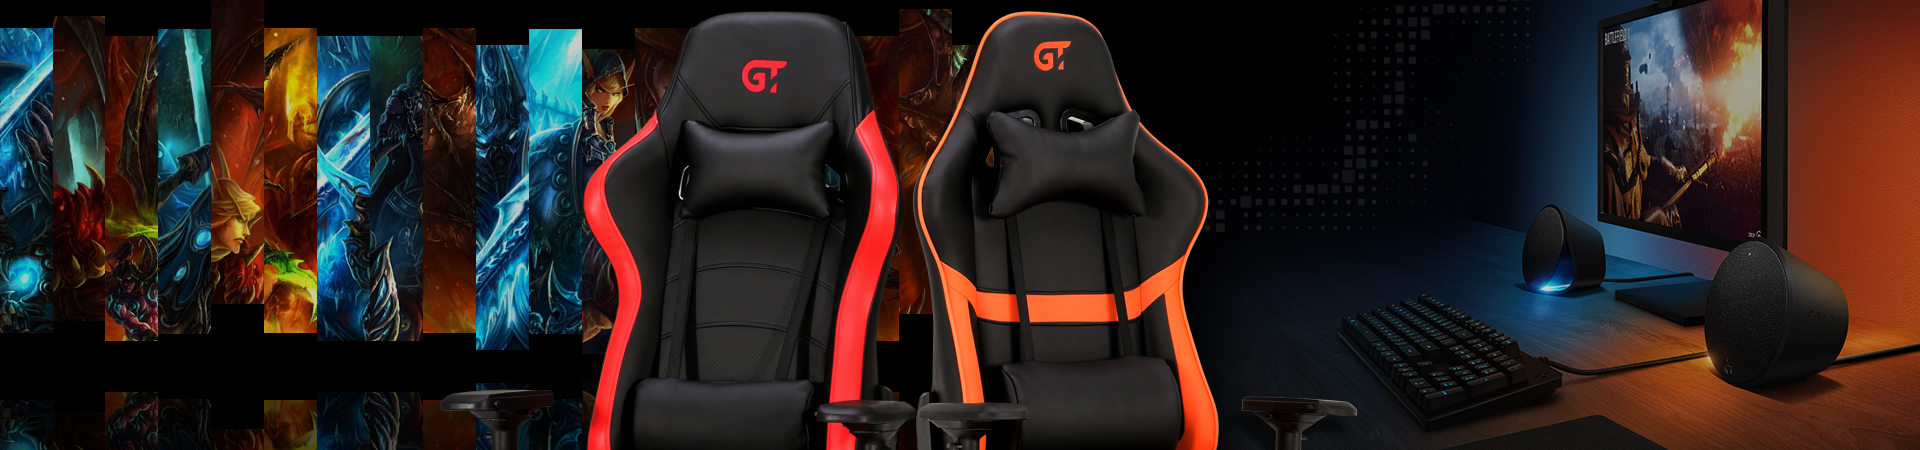 Геймерські крісла Серія X-2527